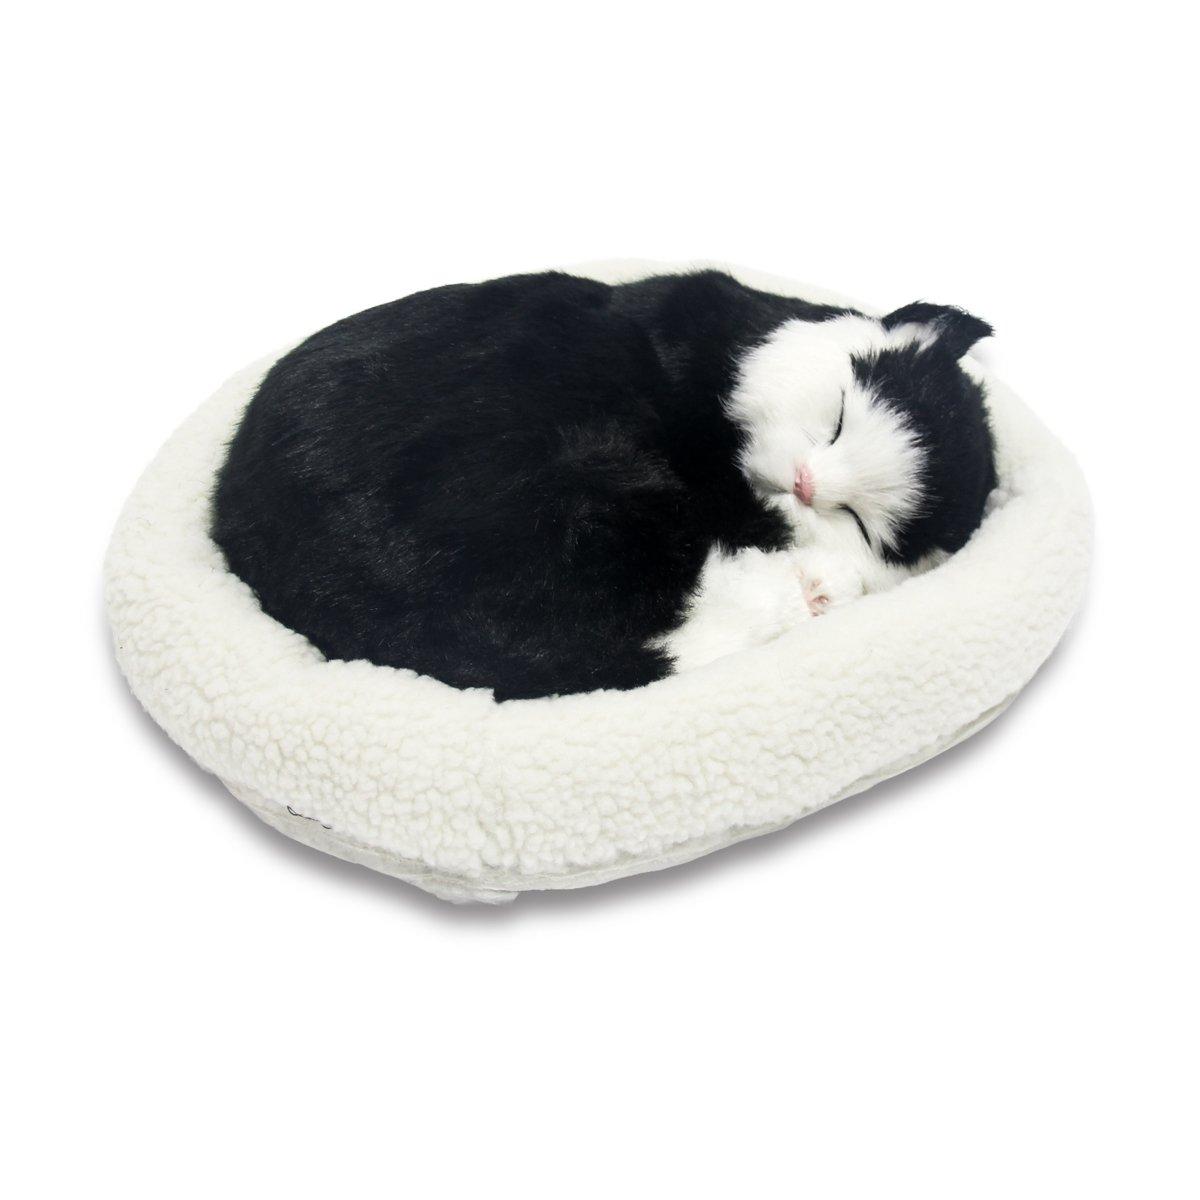 Signstek Breathing Sleeping Plush Kitty Cat Pet Black & White Shorthair by Signstek